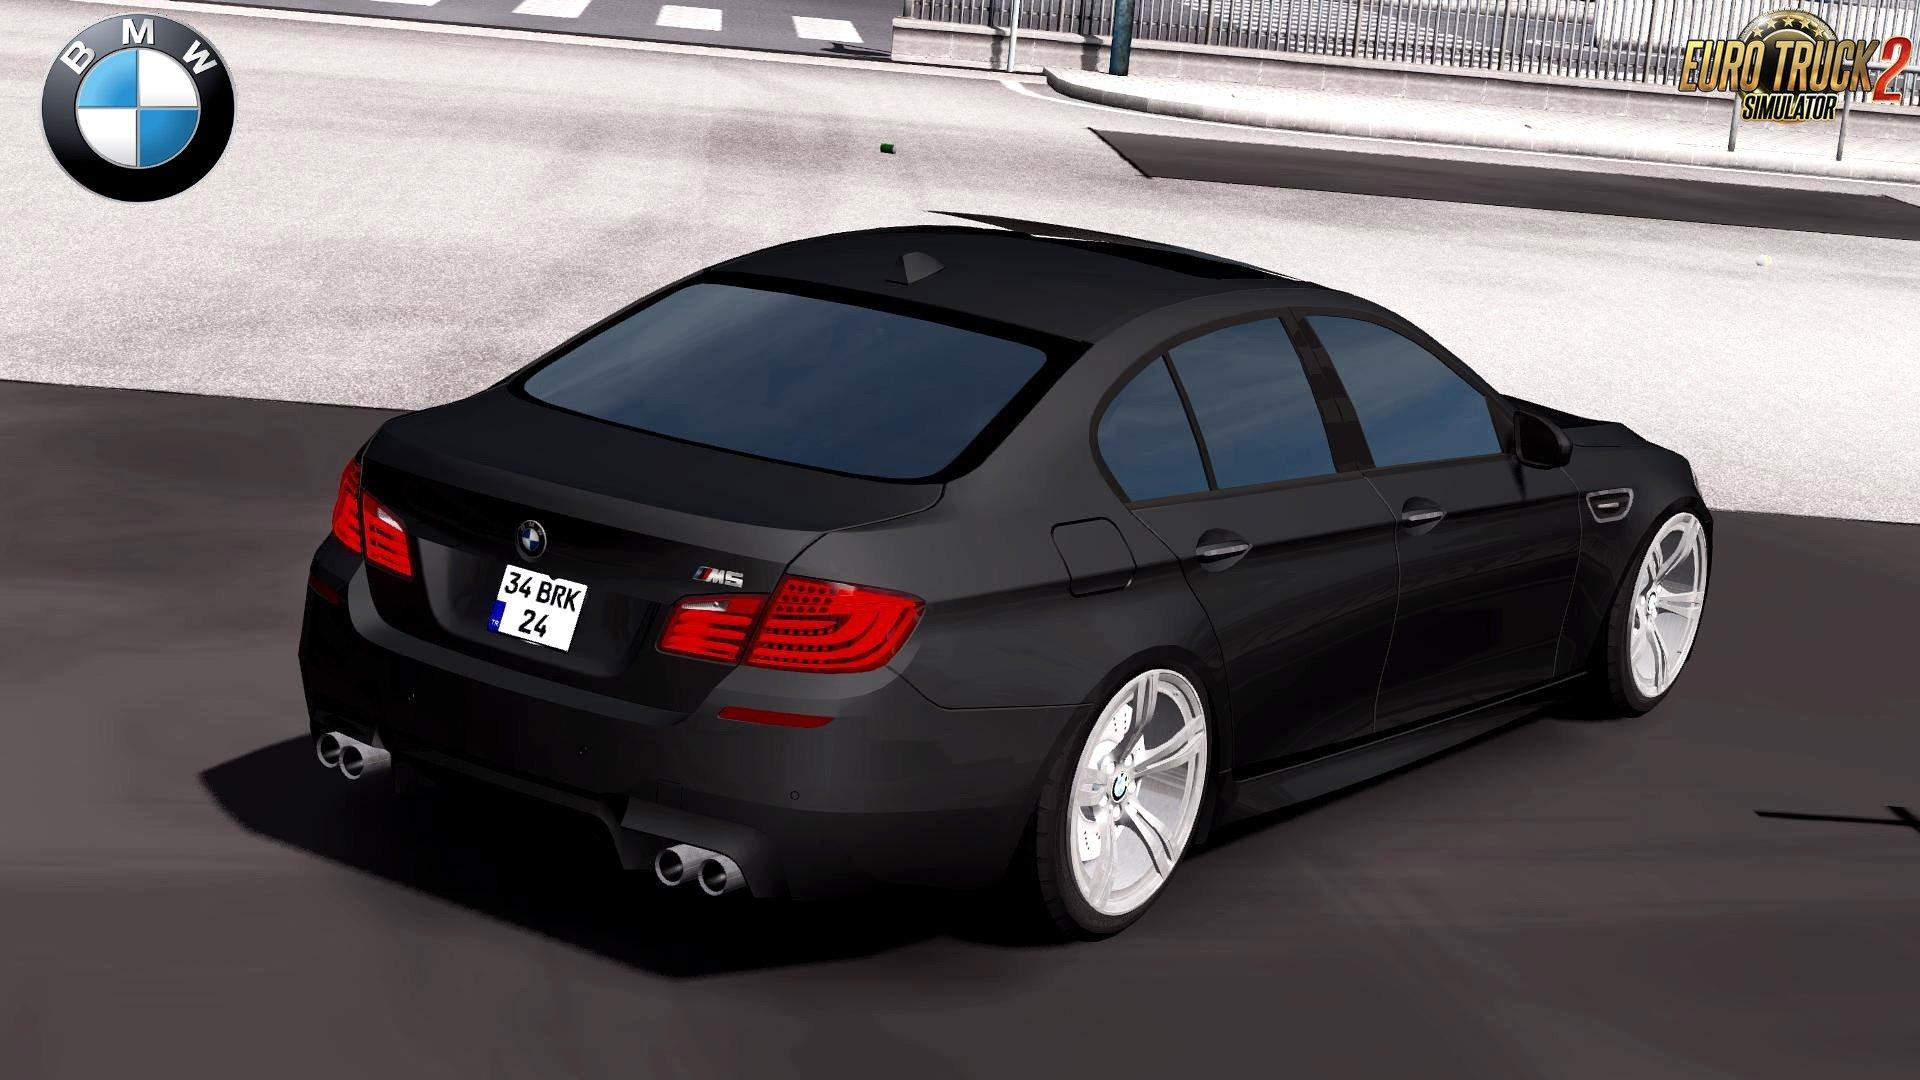 BMW M5 F10 + Interior v3.0 (Upgraded) (1.28.x)